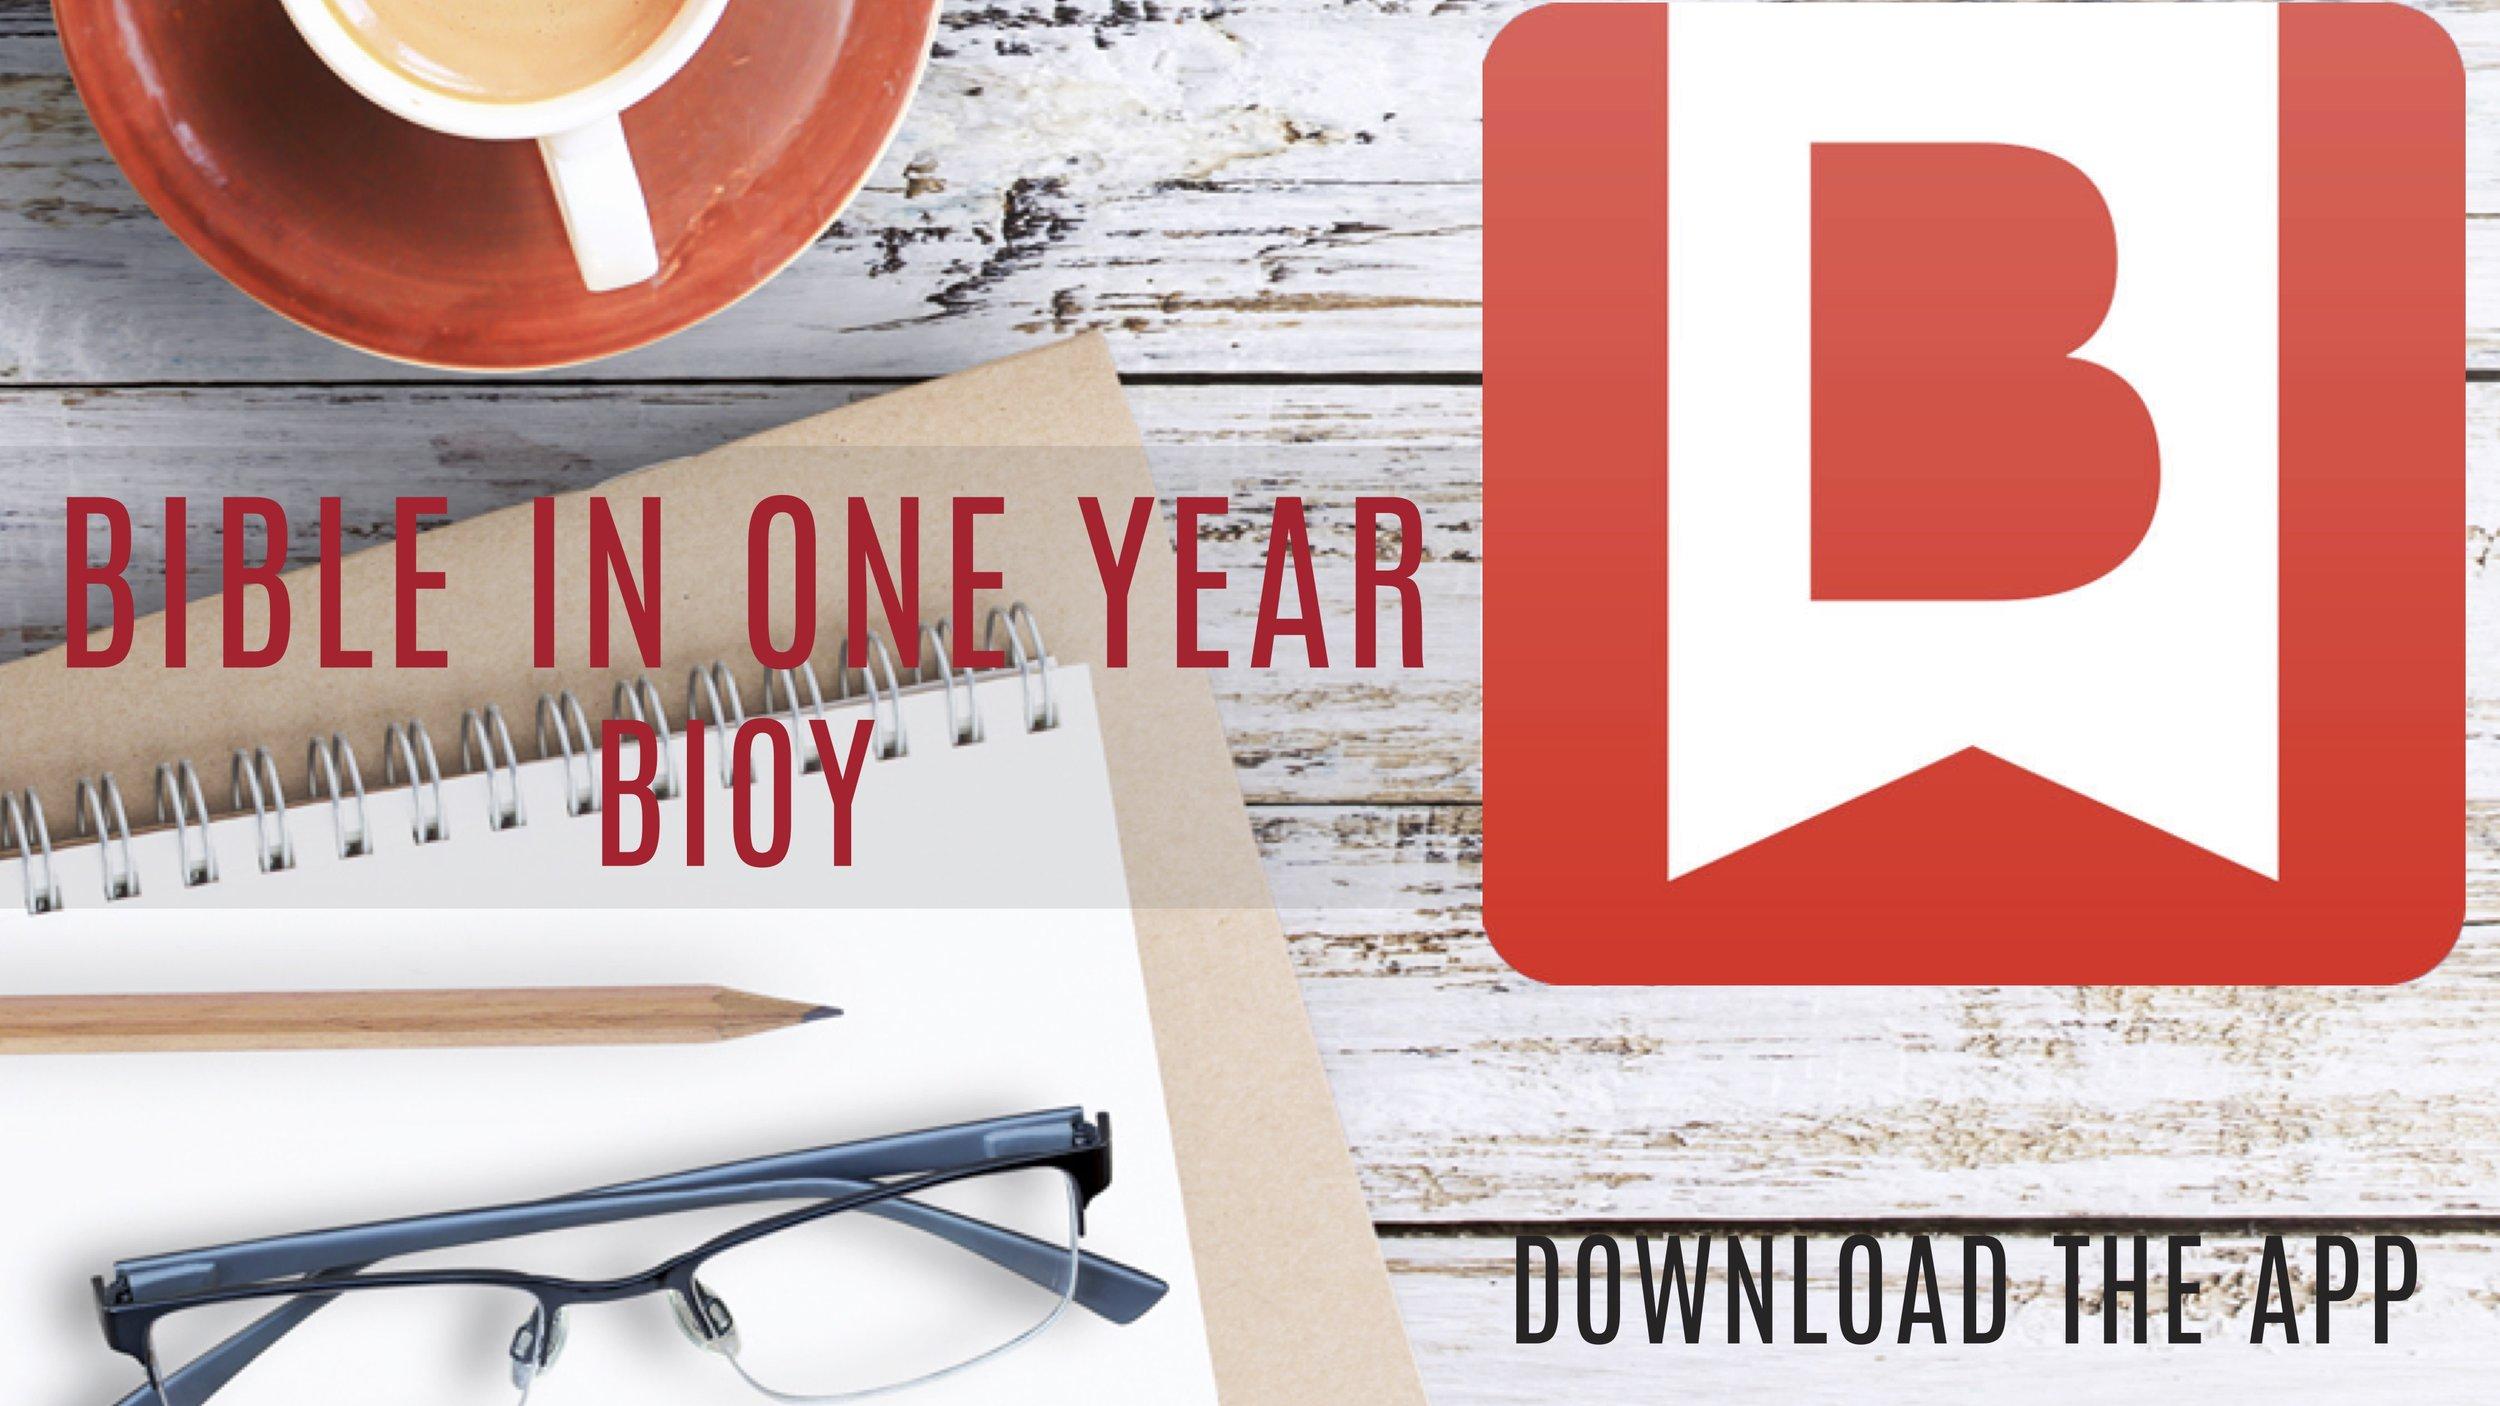 bible in one year app.jpg